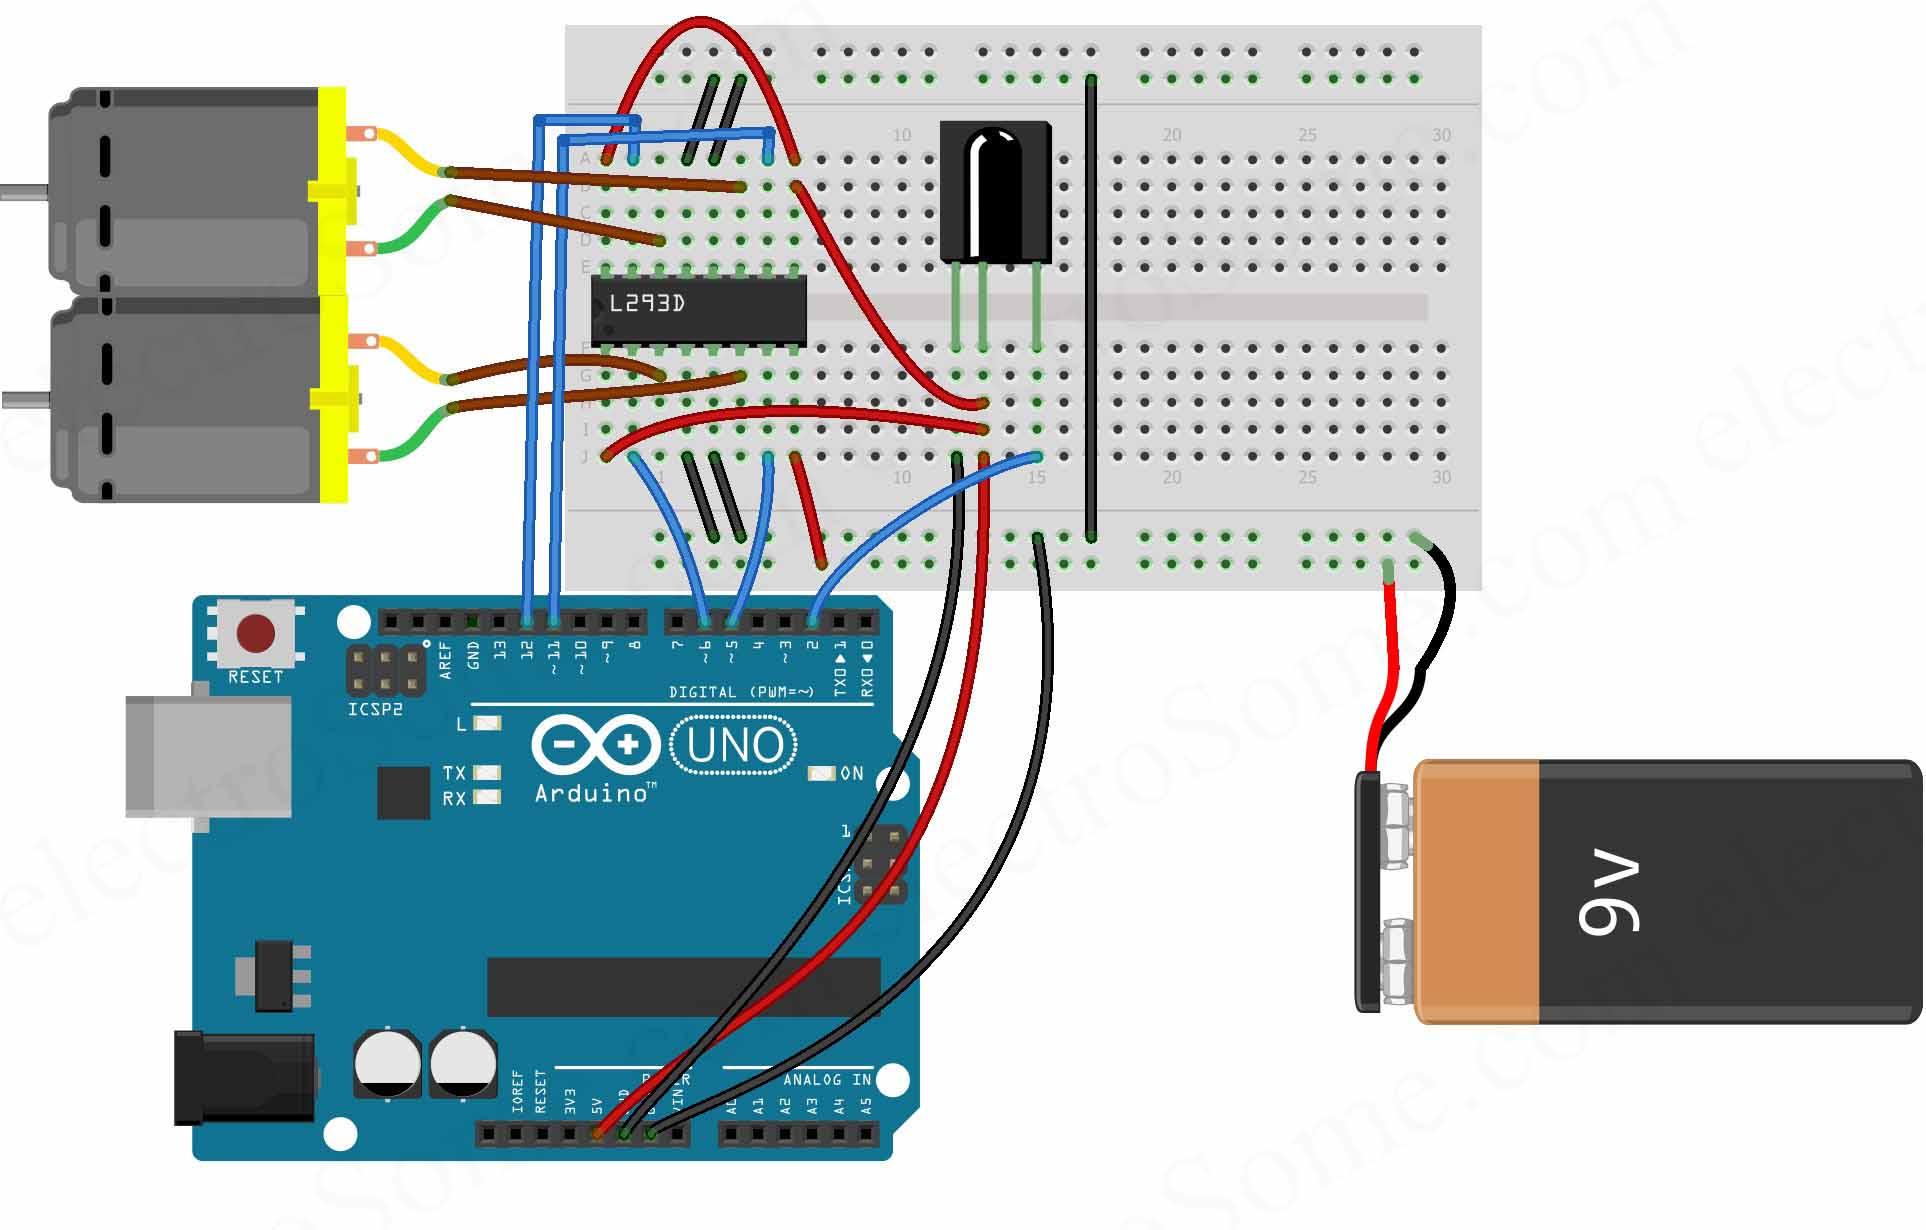 l293d motor driver circuit diagram 2007 saab 9 3 radio wiring controlling dc motors using arduino and ir remote